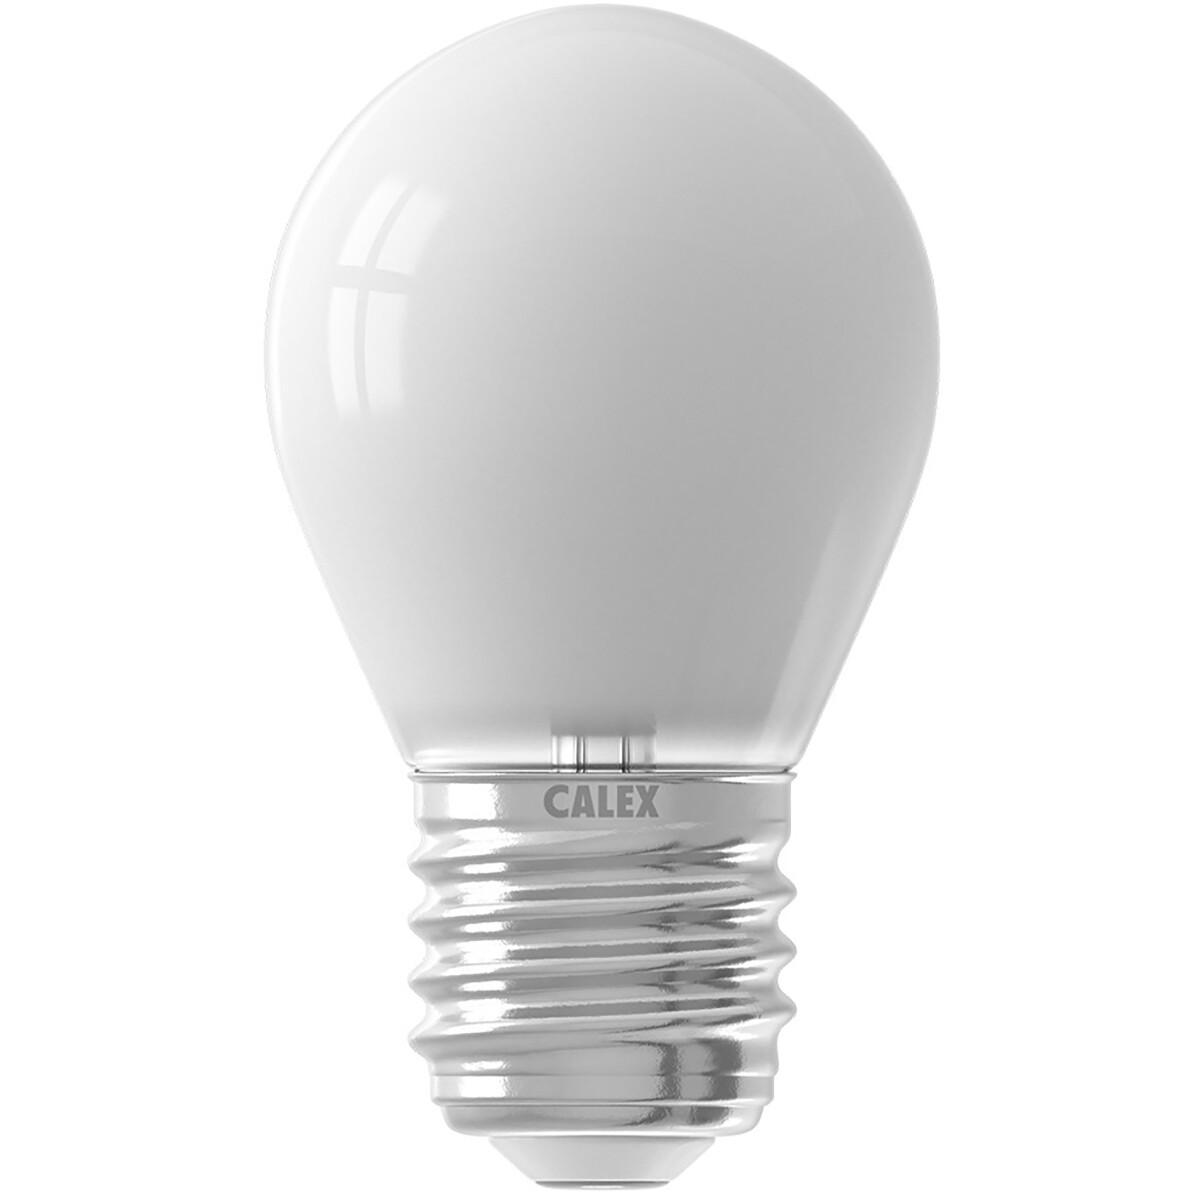 CALEX - LED Lamp - Kogellamp P45 Softline - E27 Fitting - Dimbaar - 3.5W - Warm Wit 2700K - Wit